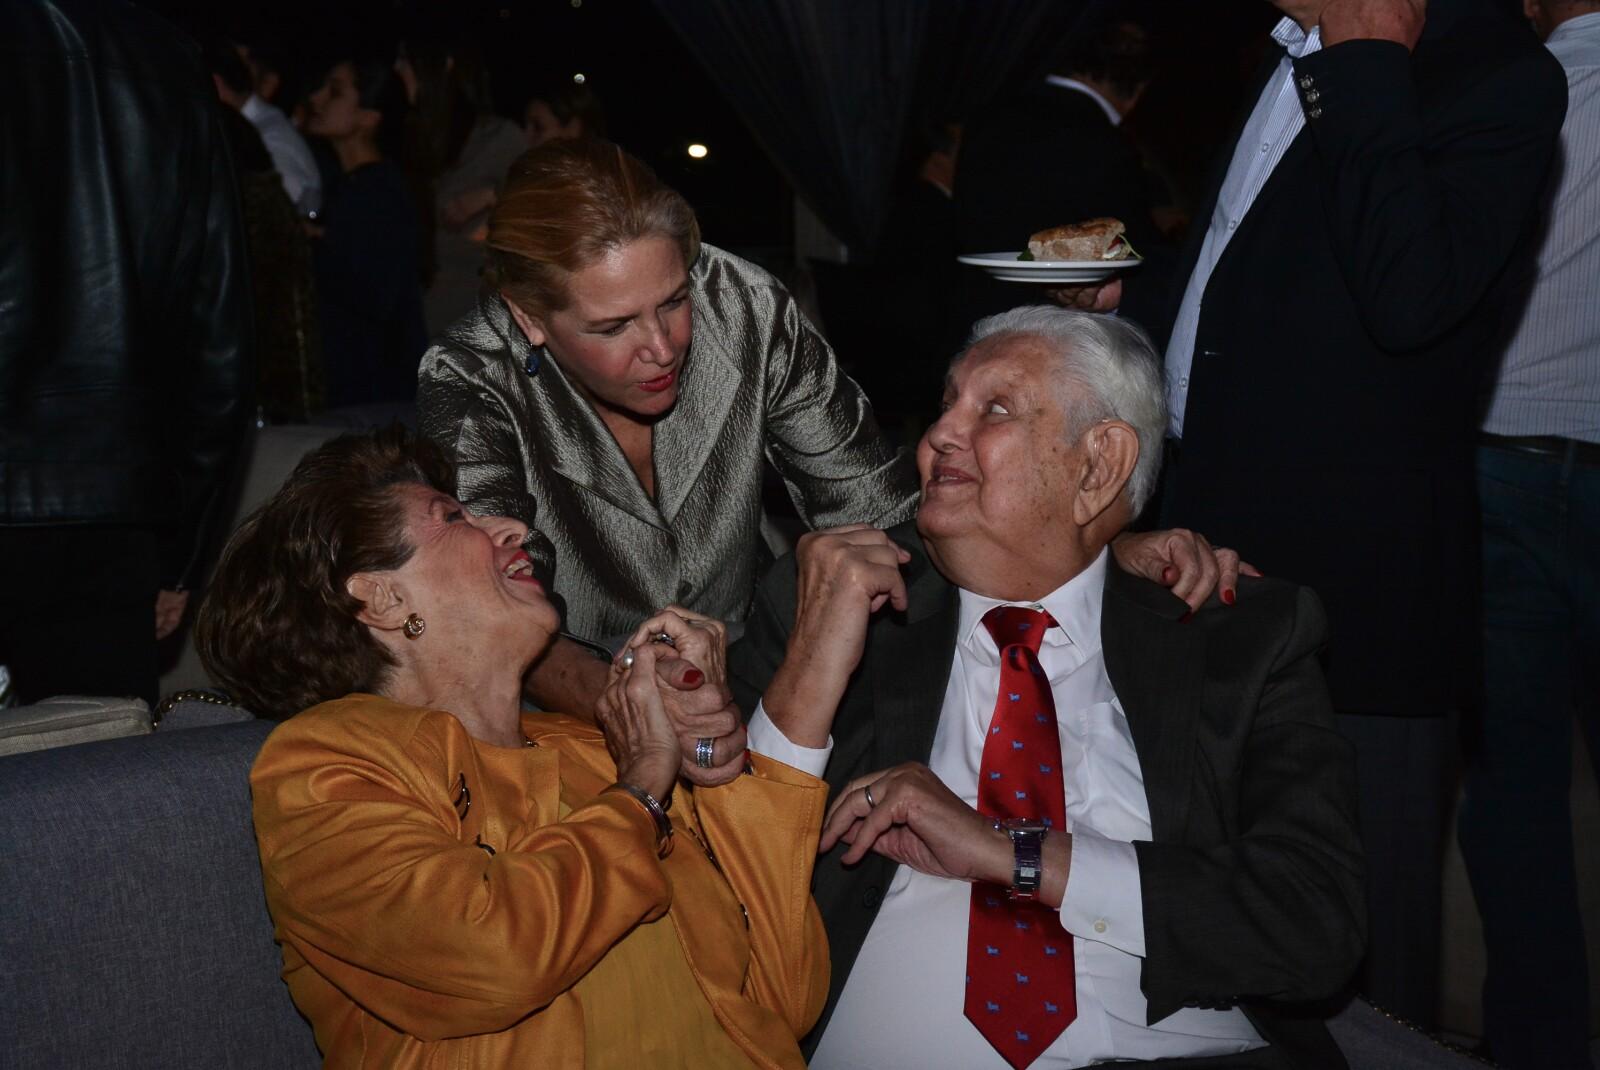 Isabel Camarena, Marisa Ángel y Pedro Martínez.jpg